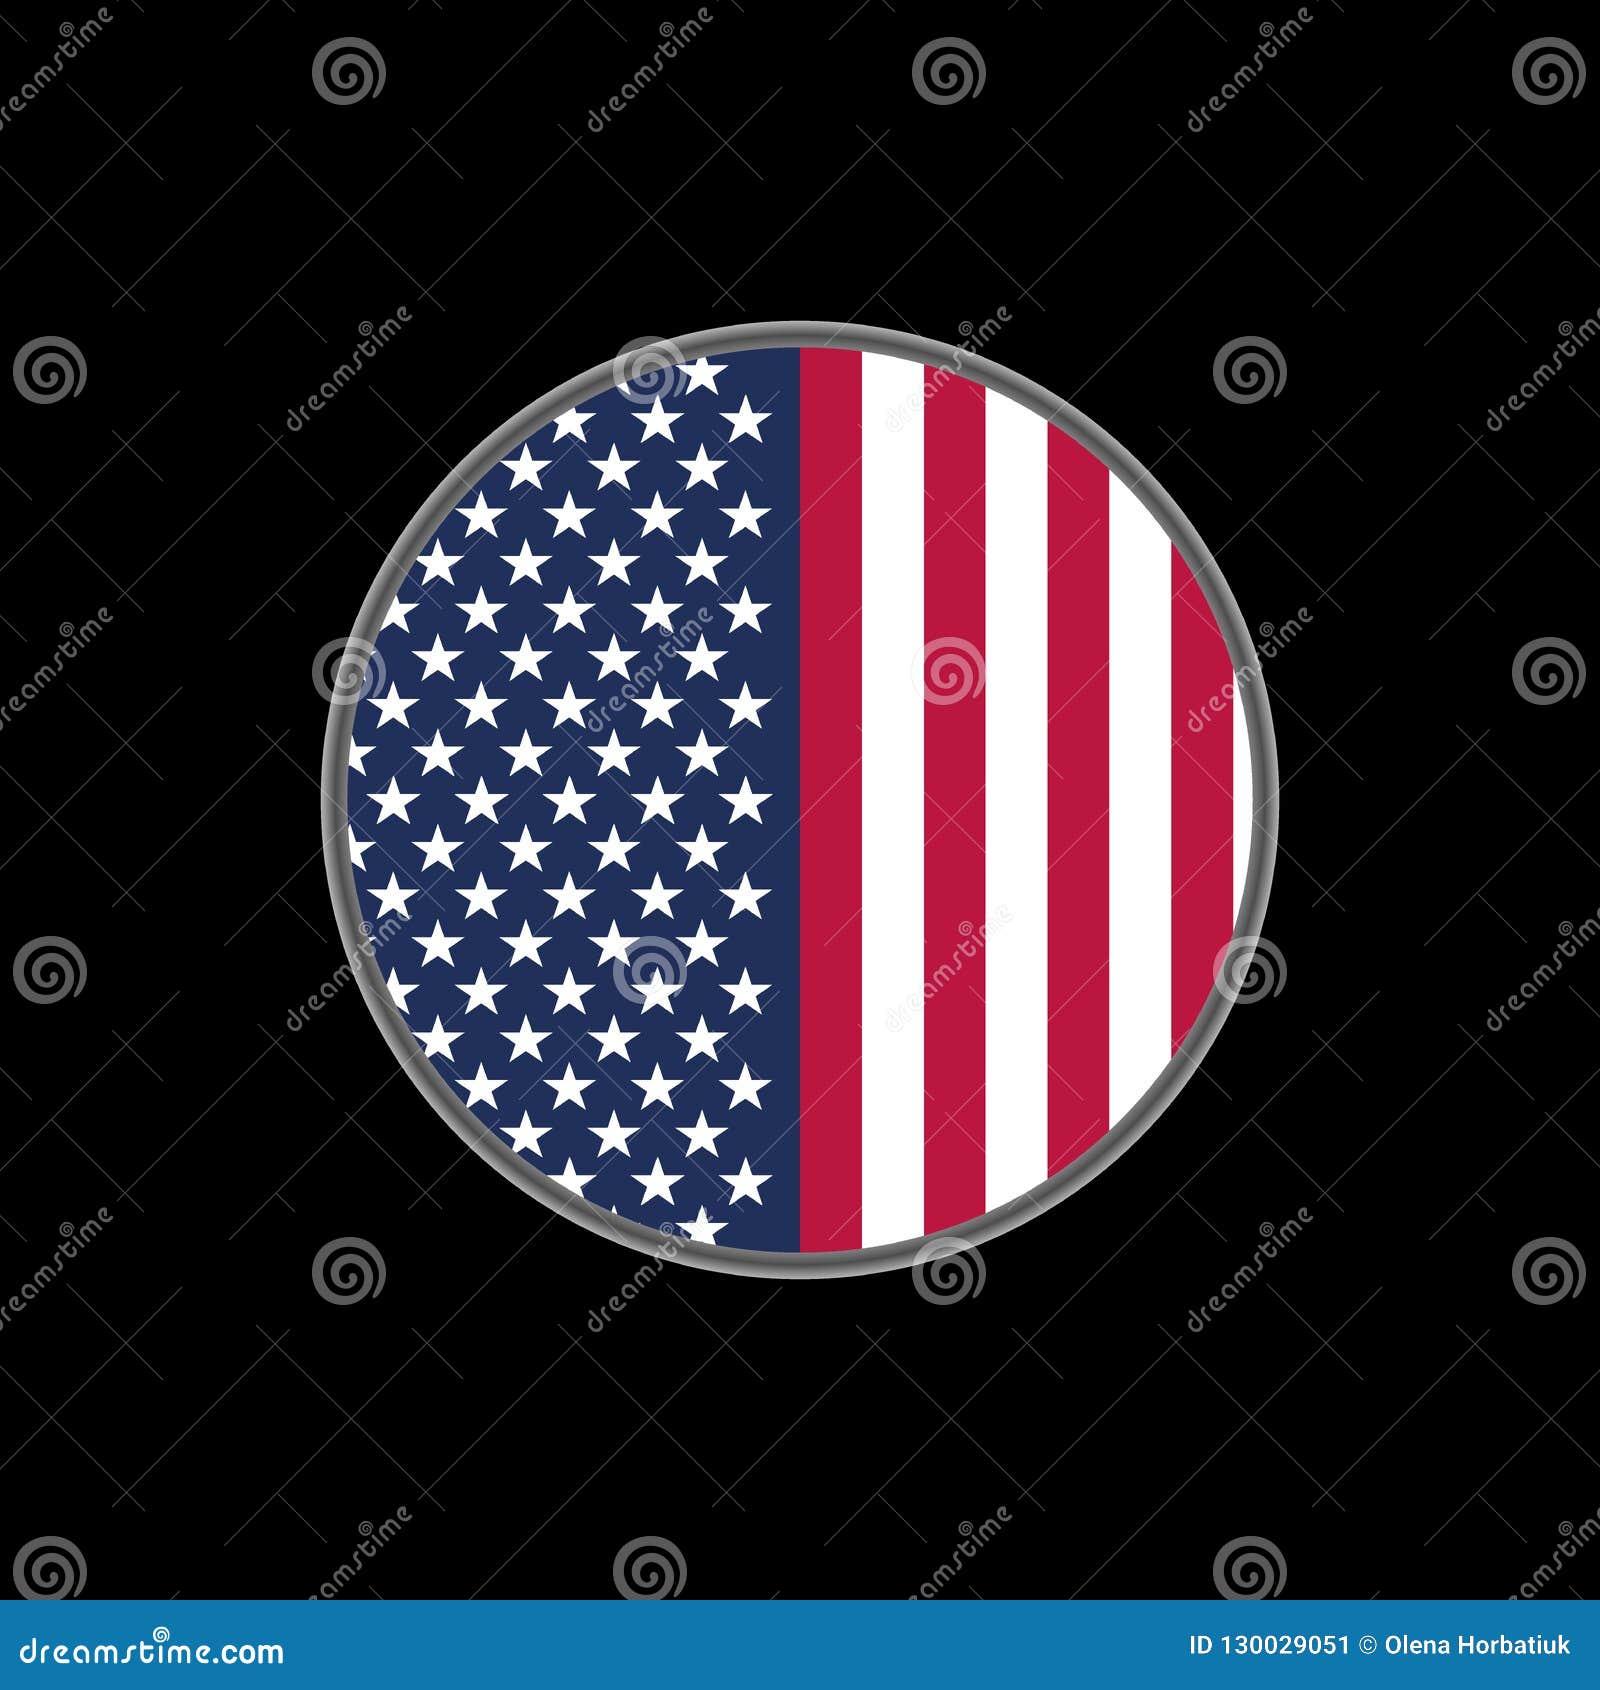 United States of America flag on circle.